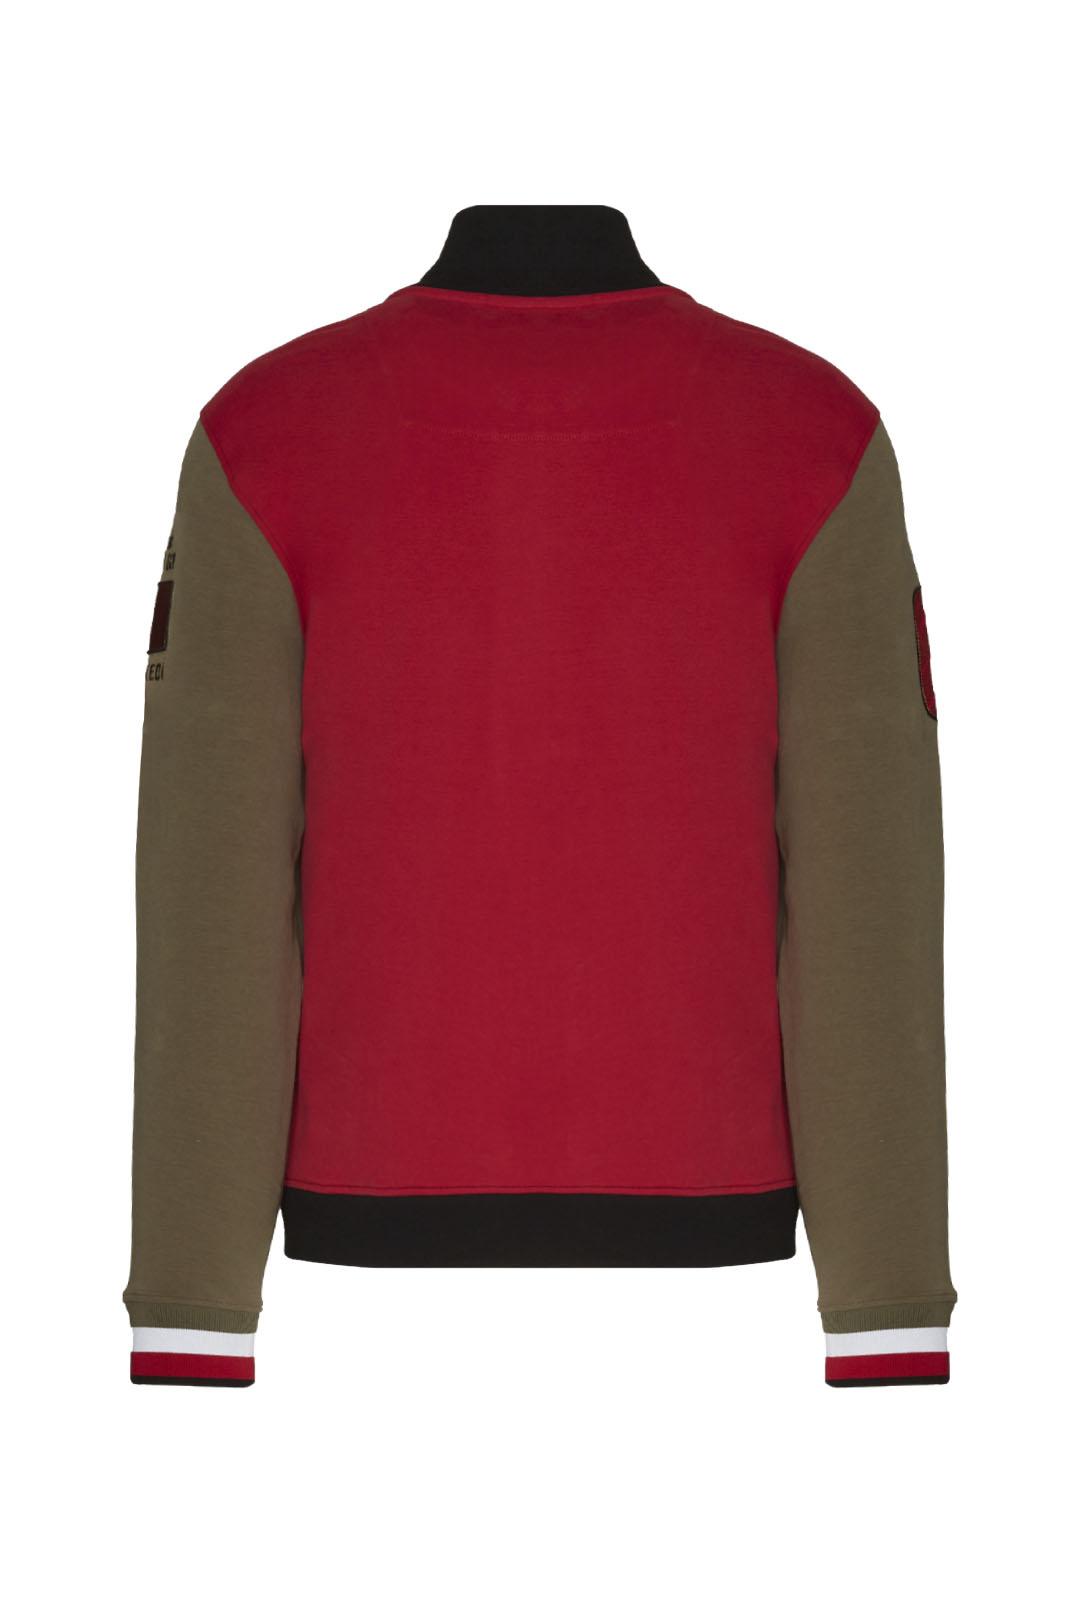 Sweatshirt 155th Group Black Panthers    2